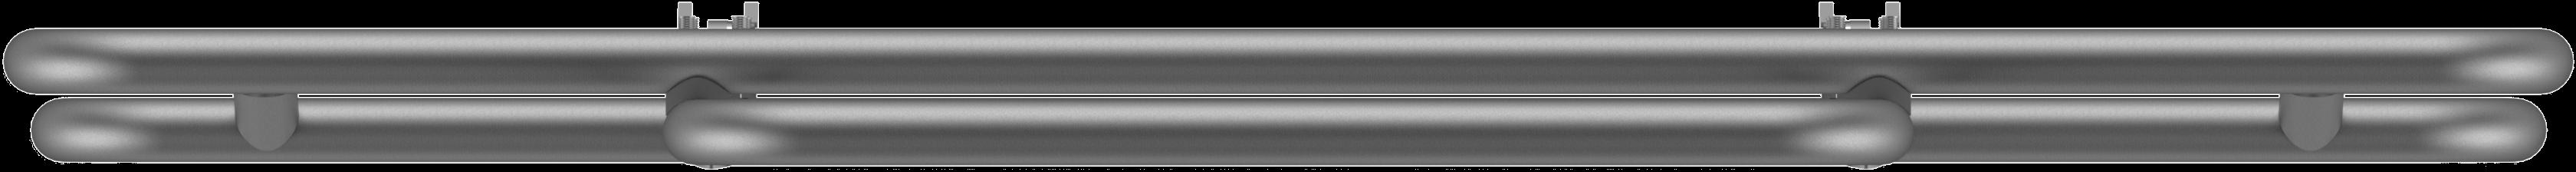 HD-595